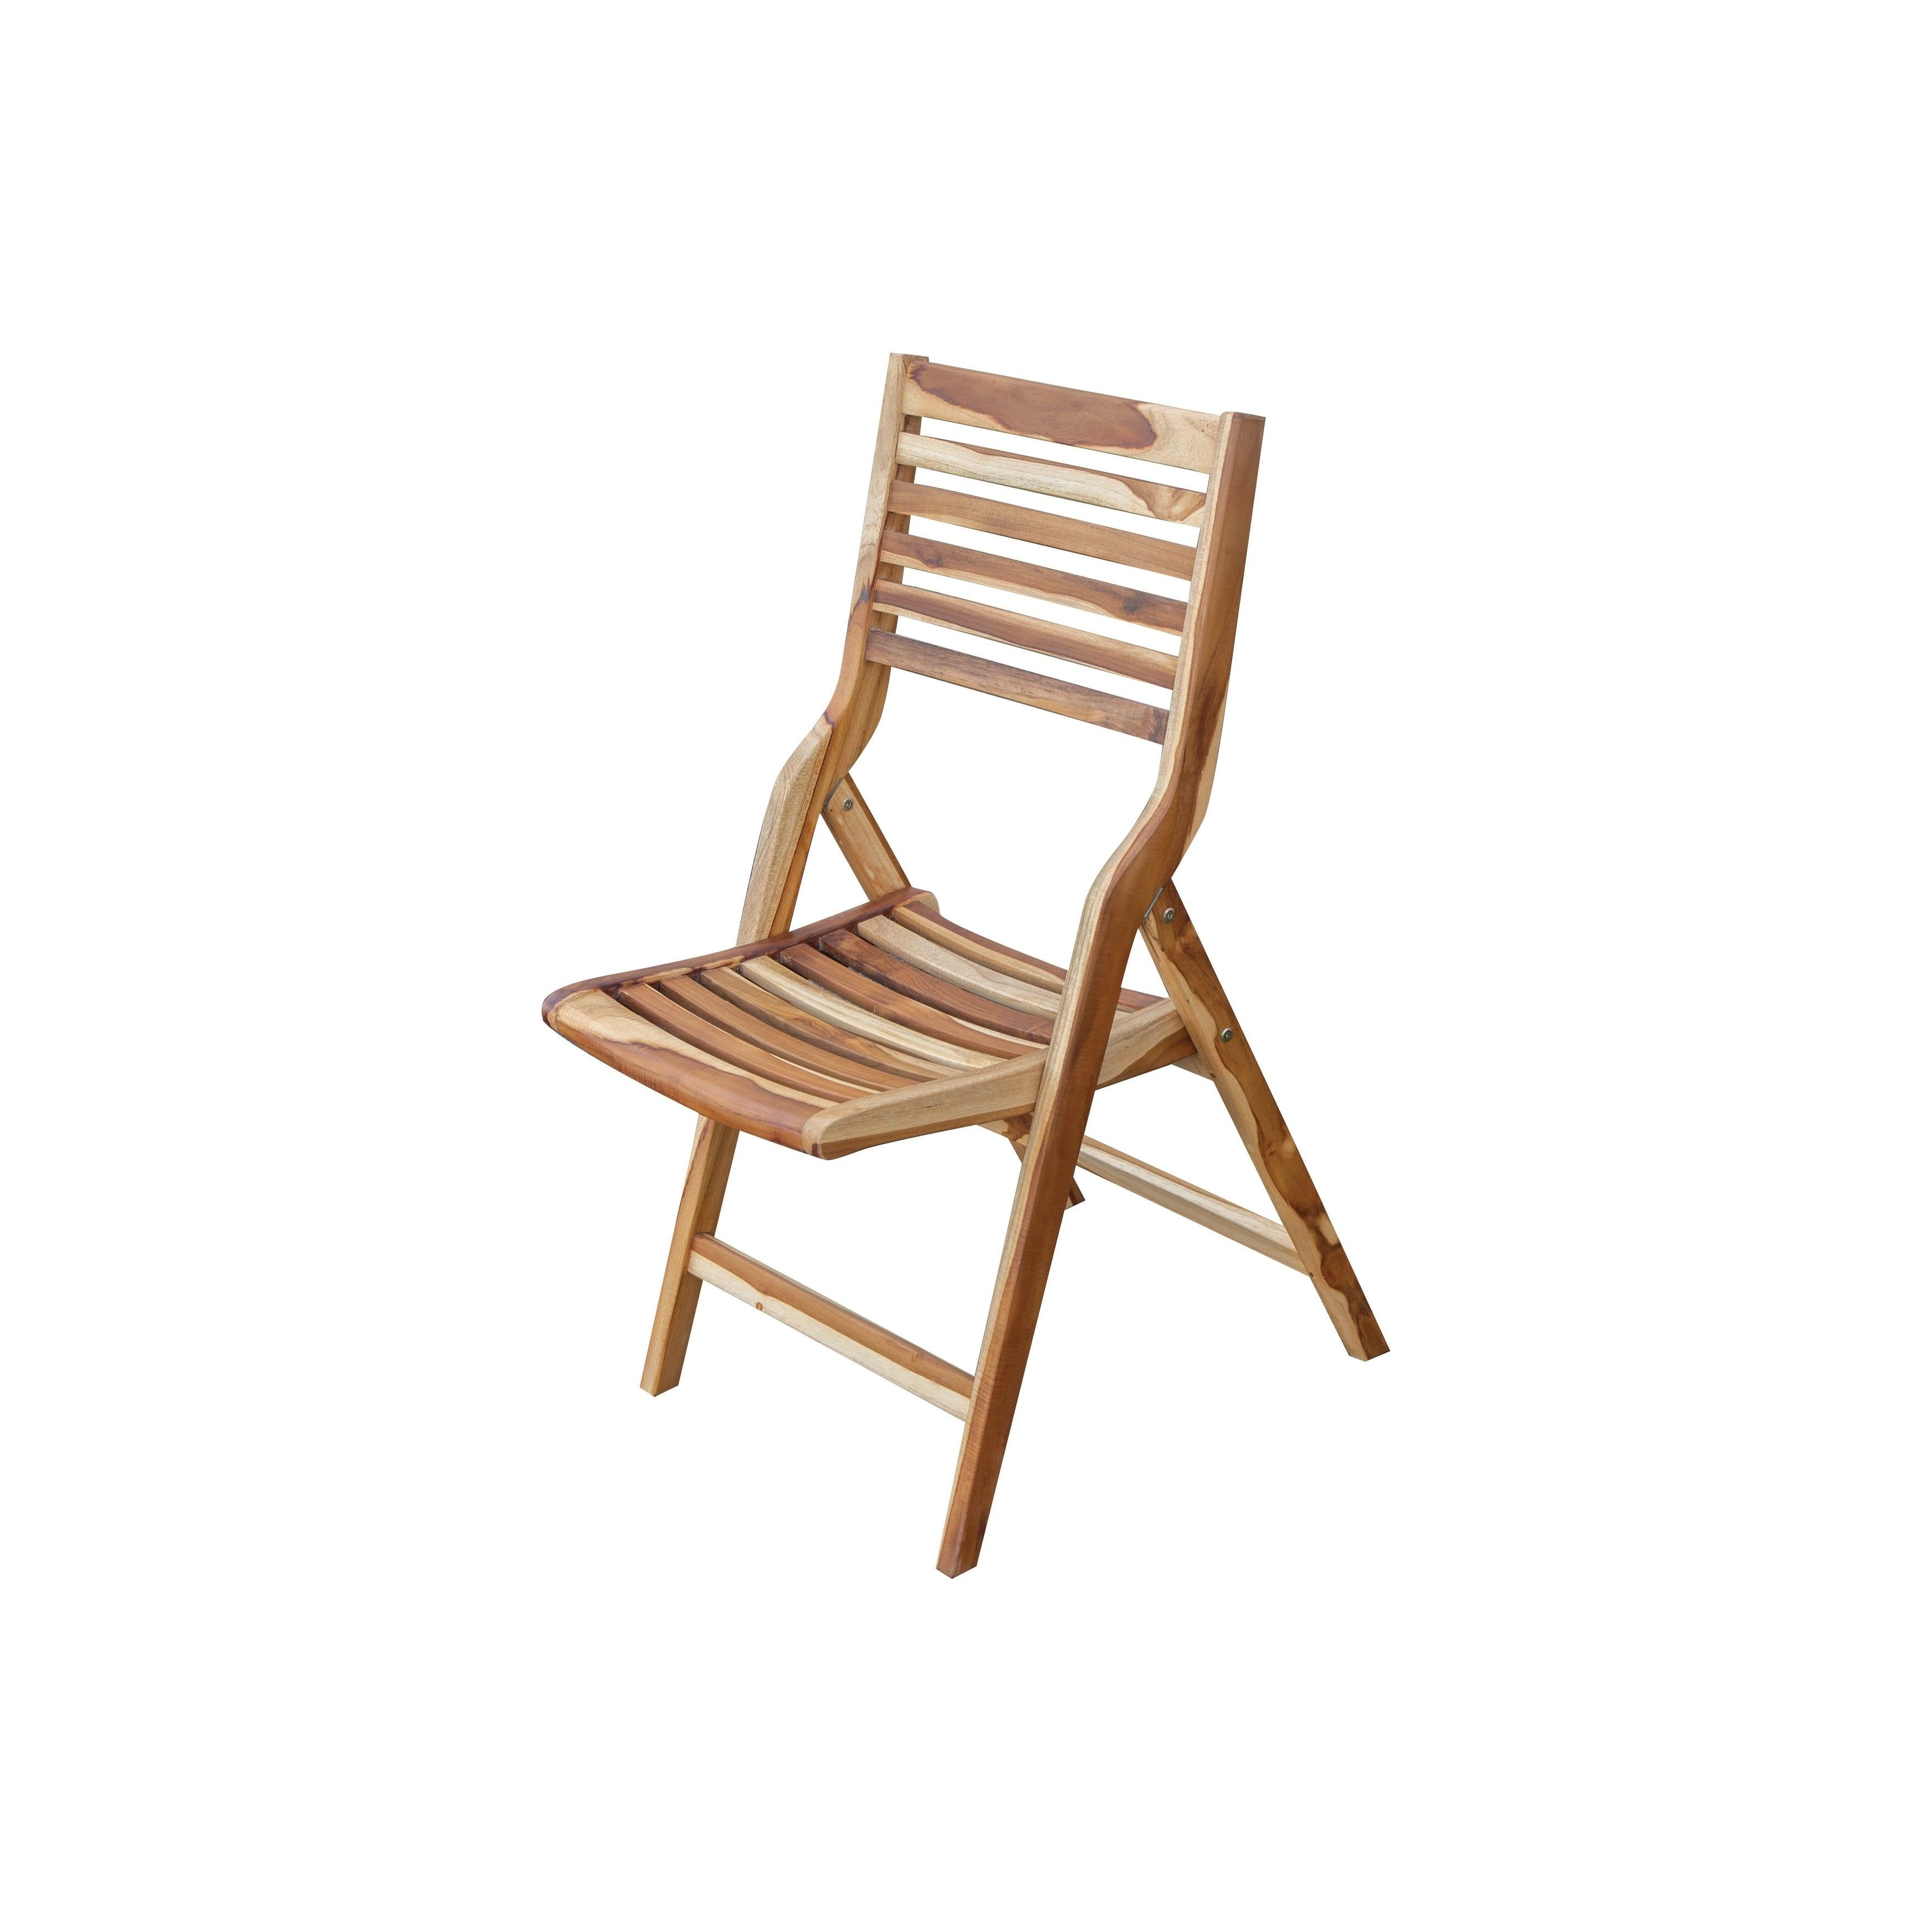 Ecodecors Mid Century Modern Teak Folding Chair Earthyteak